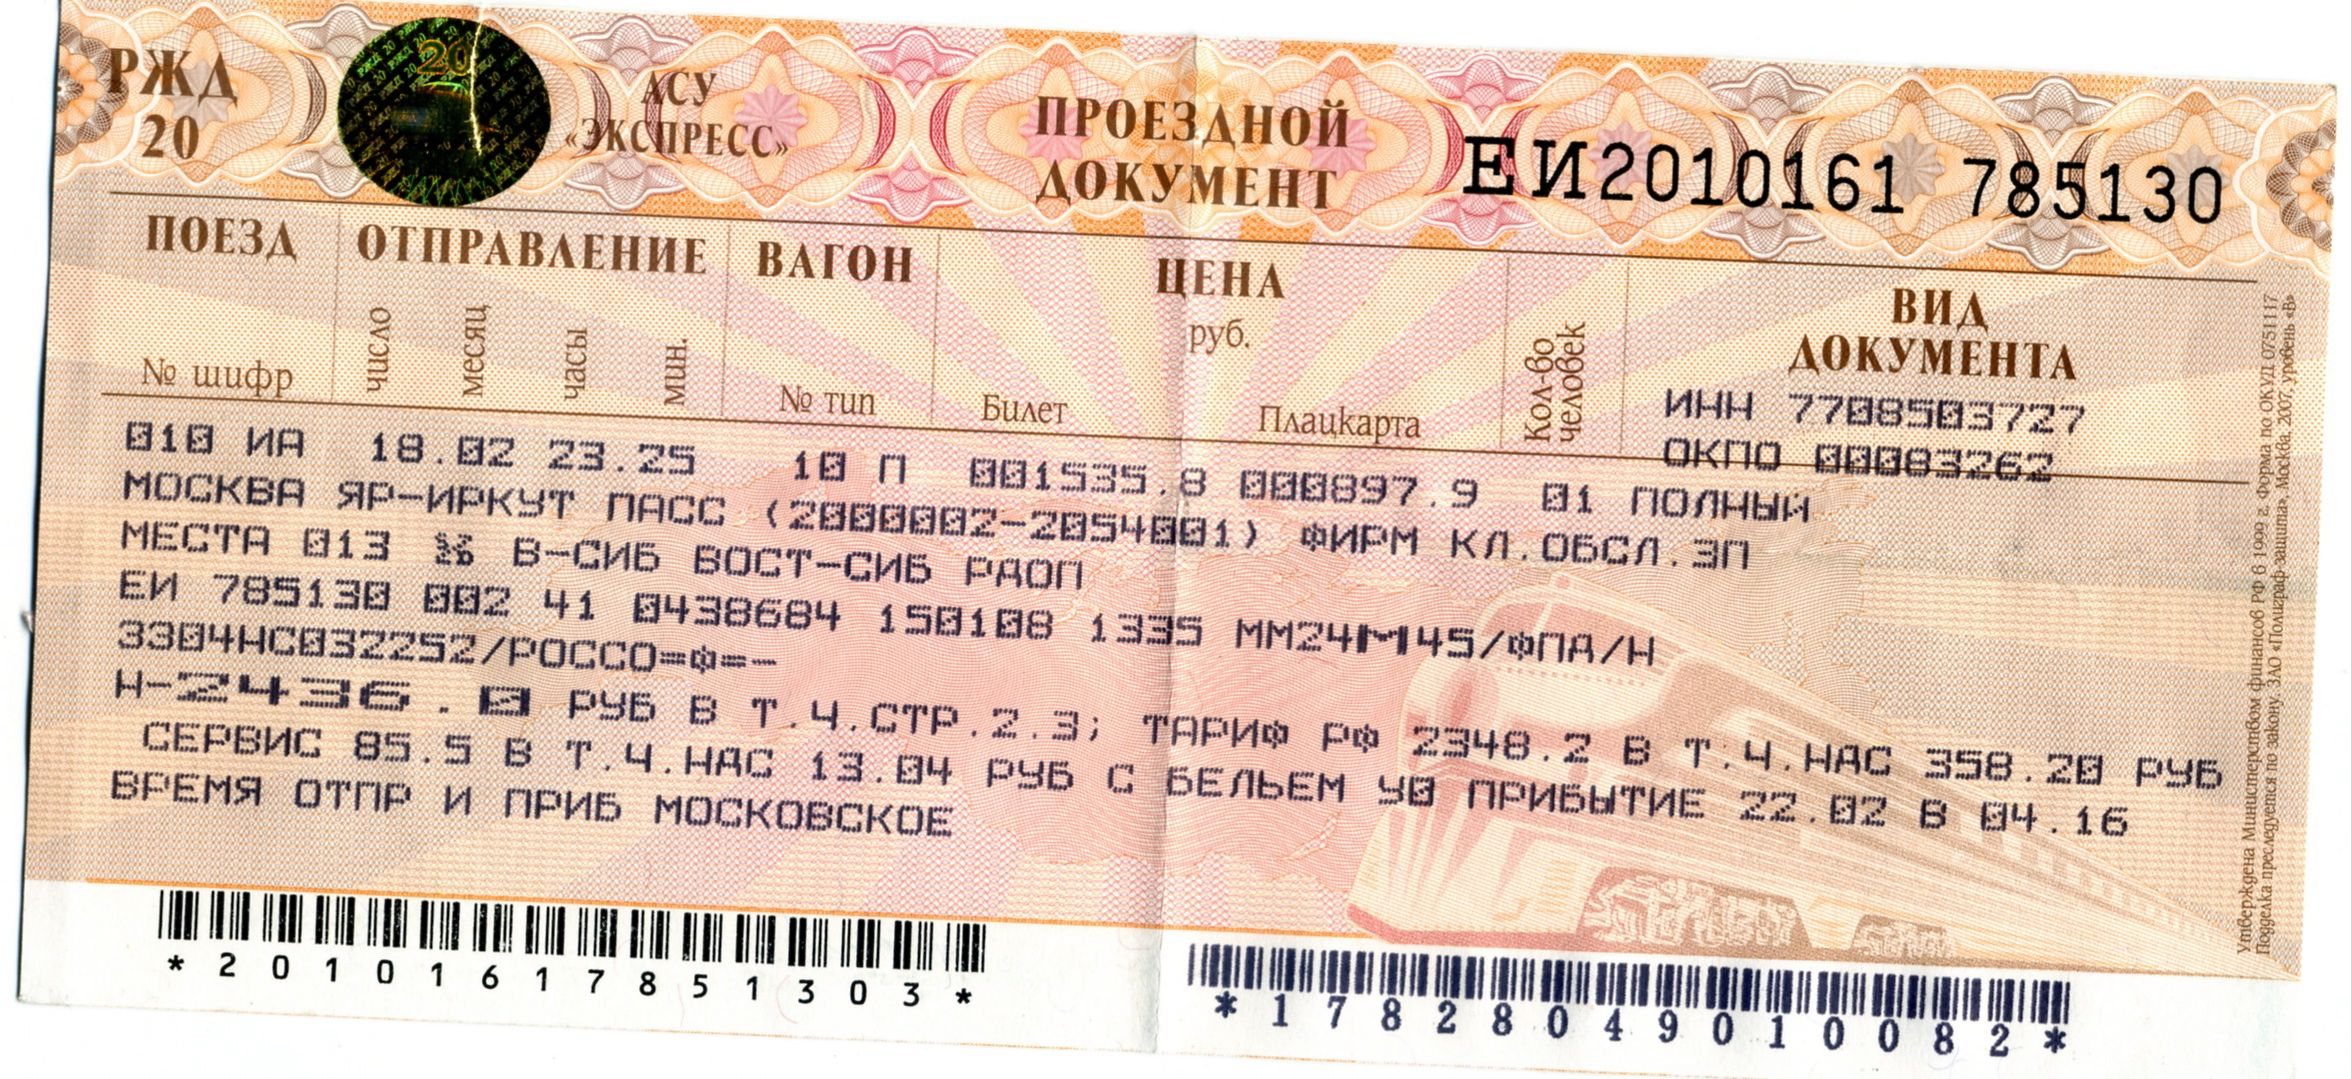 mon billet de transsib (2008)